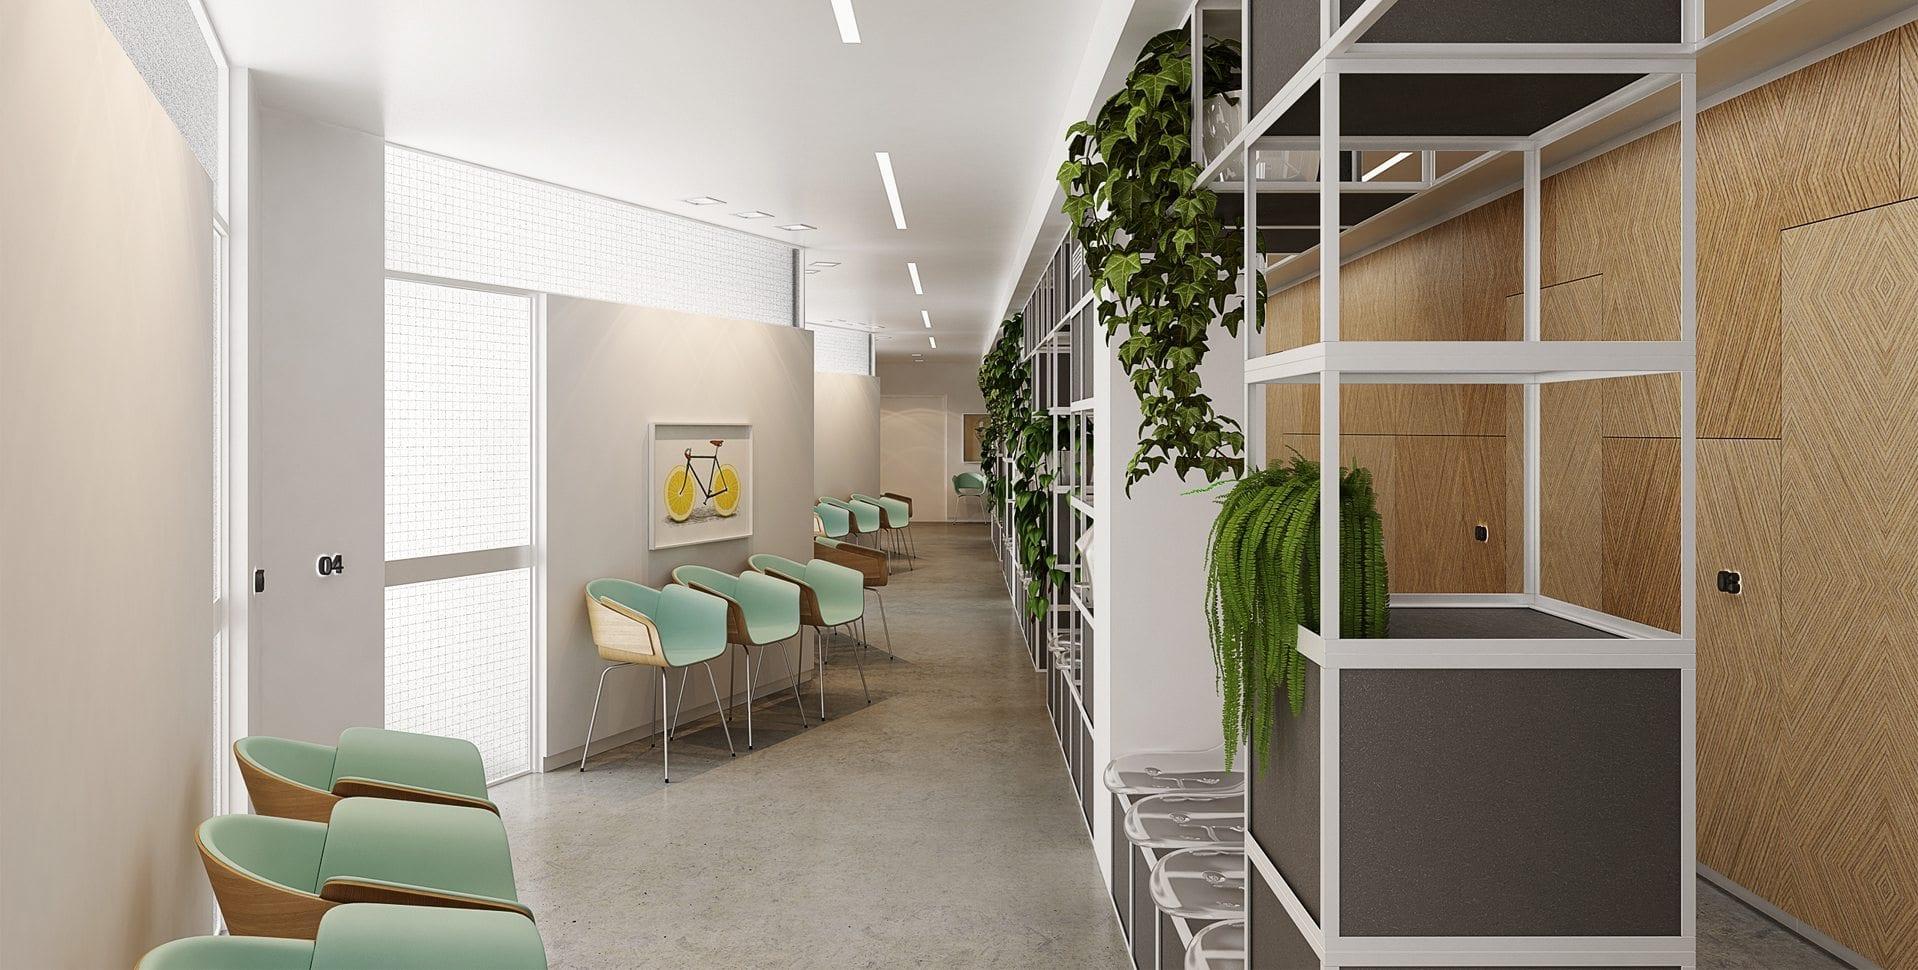 Maayan-Golan_Architectural-Visualization_ clinic-visualization_hallway_habarzel-tel-aviv_design-zarka-arch-naomi-szwec_01